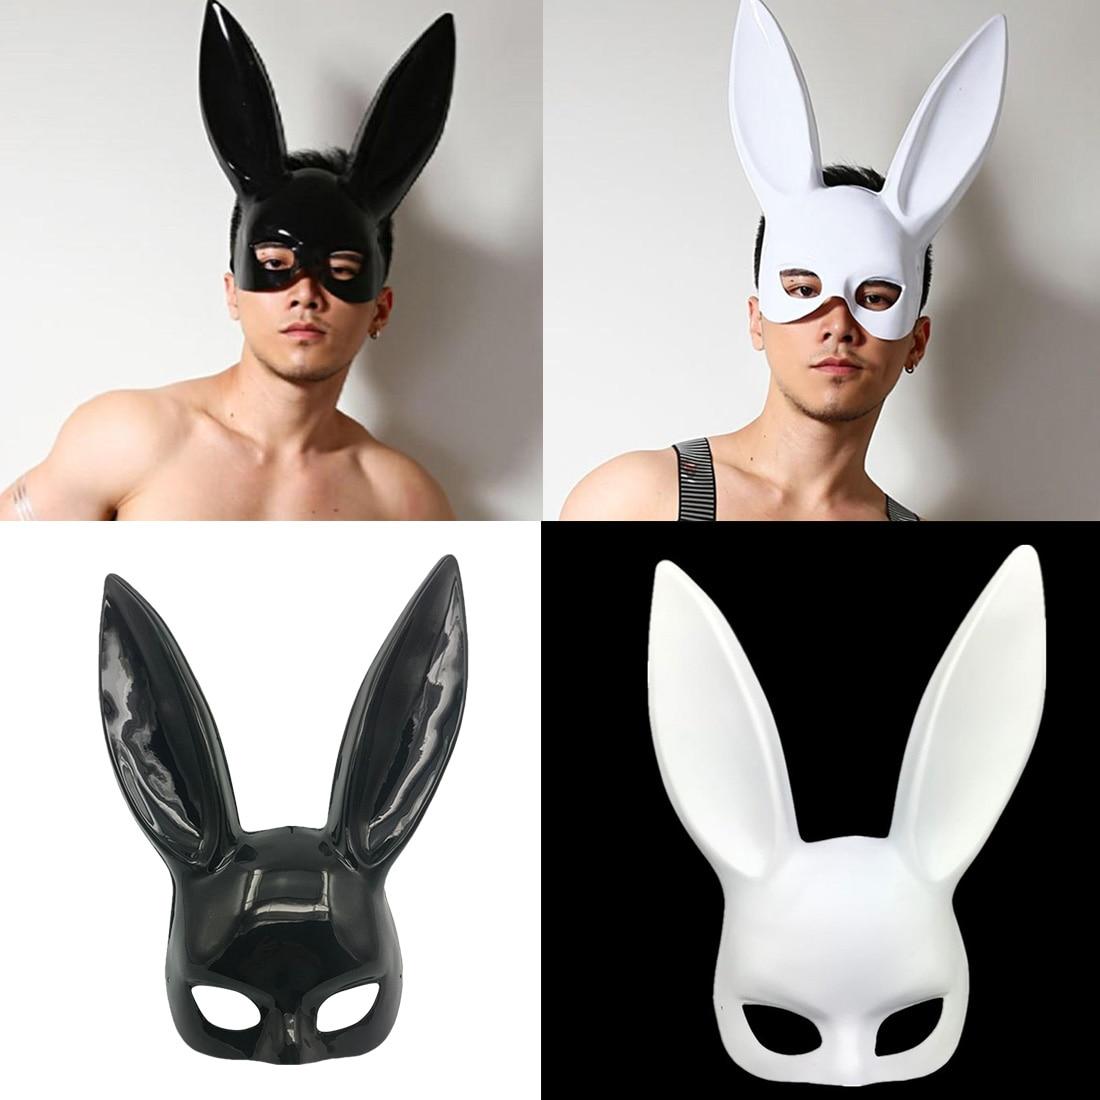 Mark Black Women Girl Sexy Rabbit Ears Mask Cute Bunny Long Ears Bondage Mask Halloween Masquerade Party Costume Props